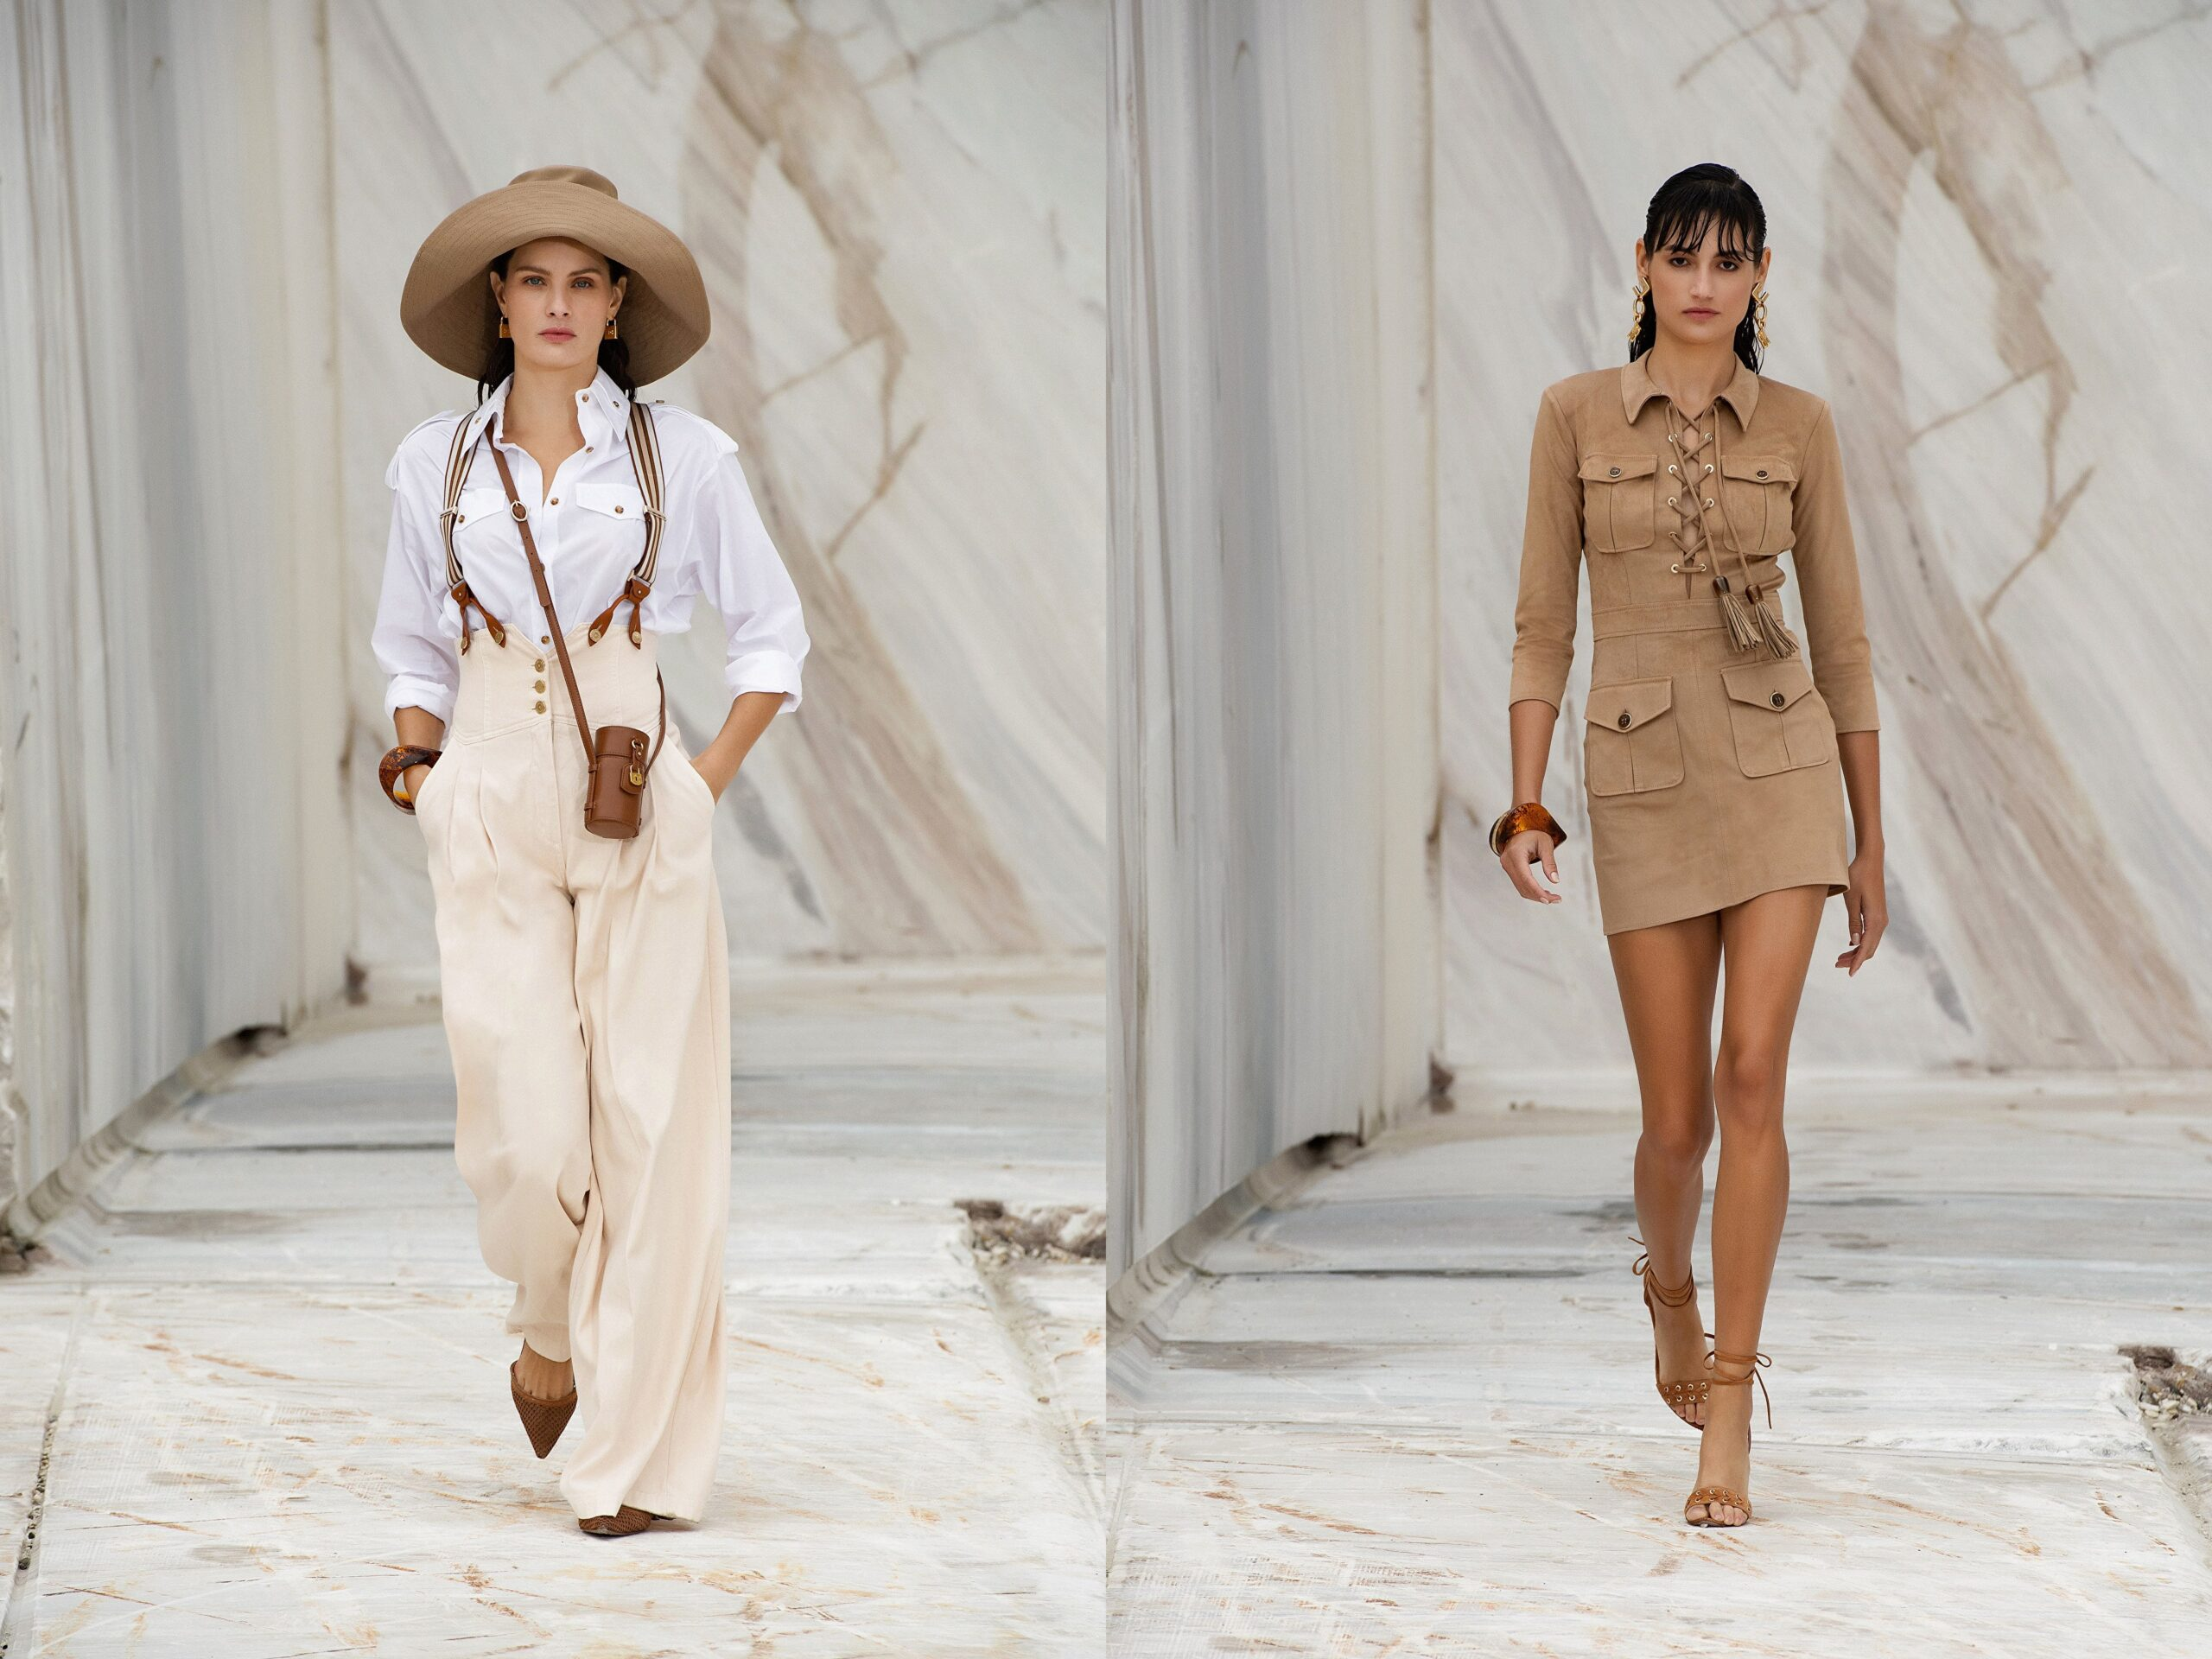 elifranchi scaled - Gli highlights della Milano Fashion Week P/E 22